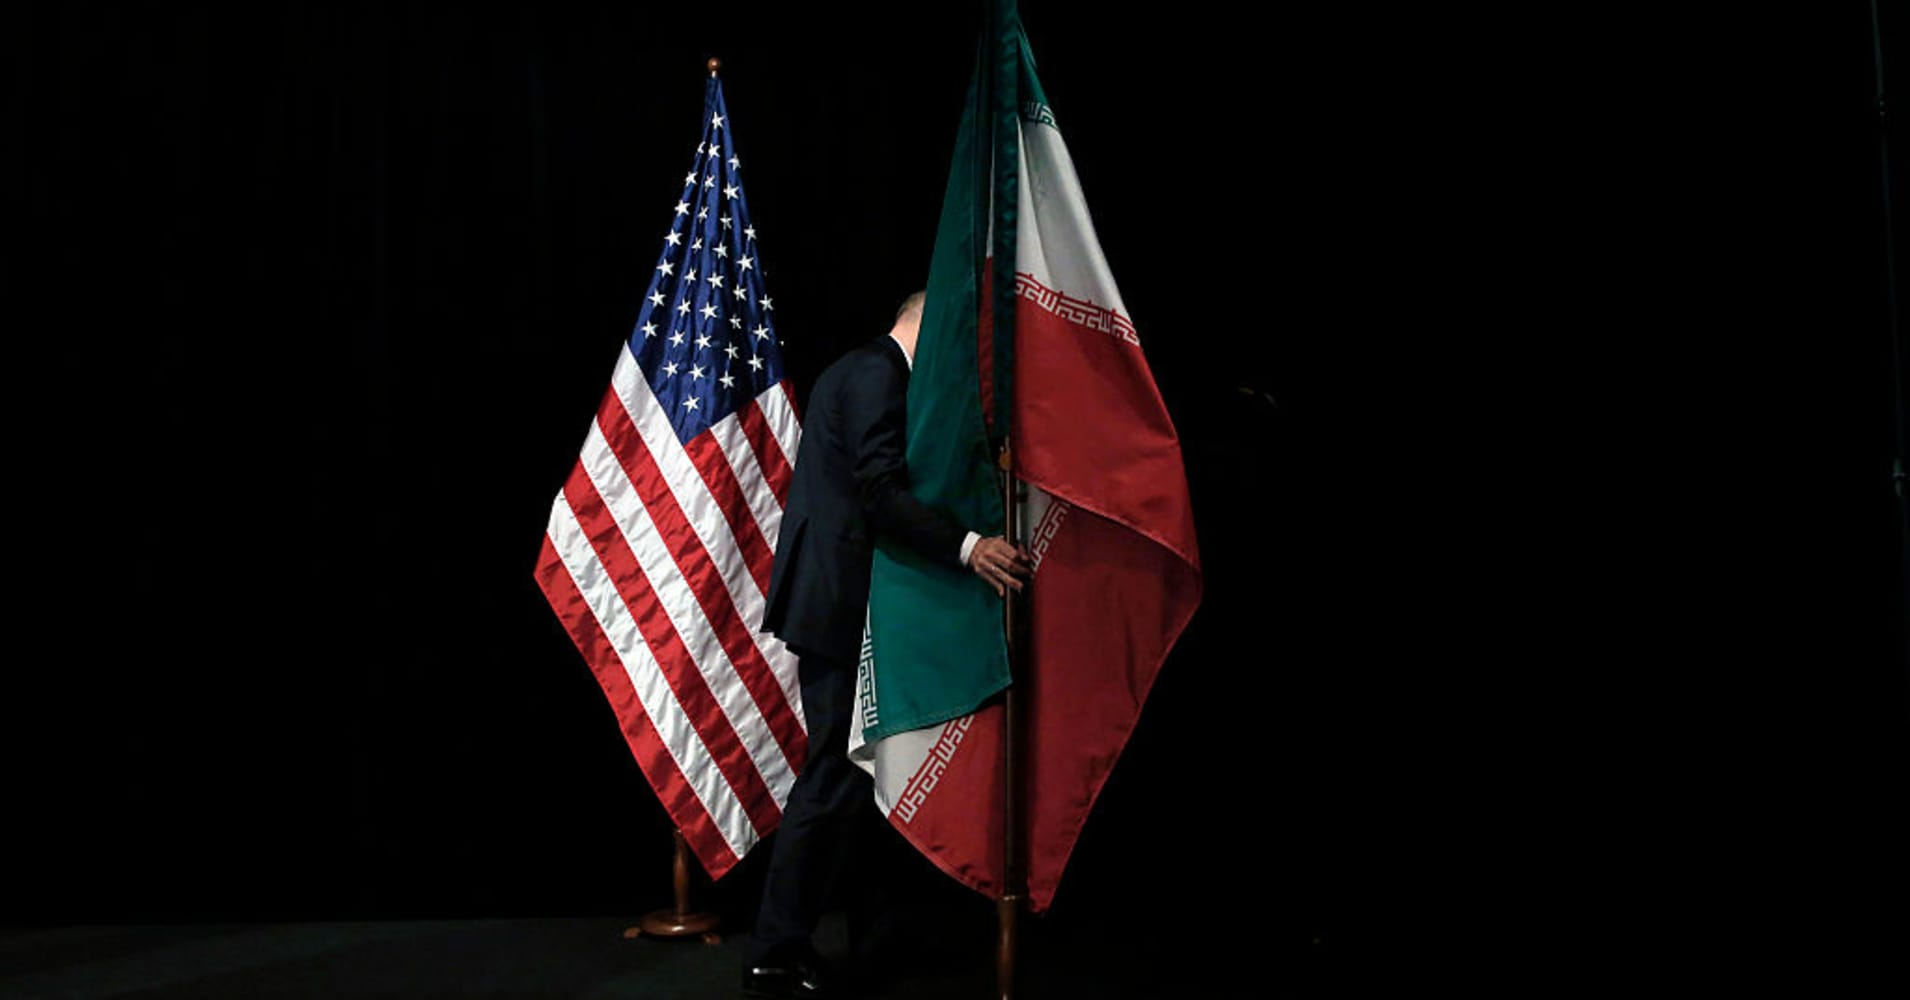 Iran sanctions 15 US firms, citing human rights and Israel ties